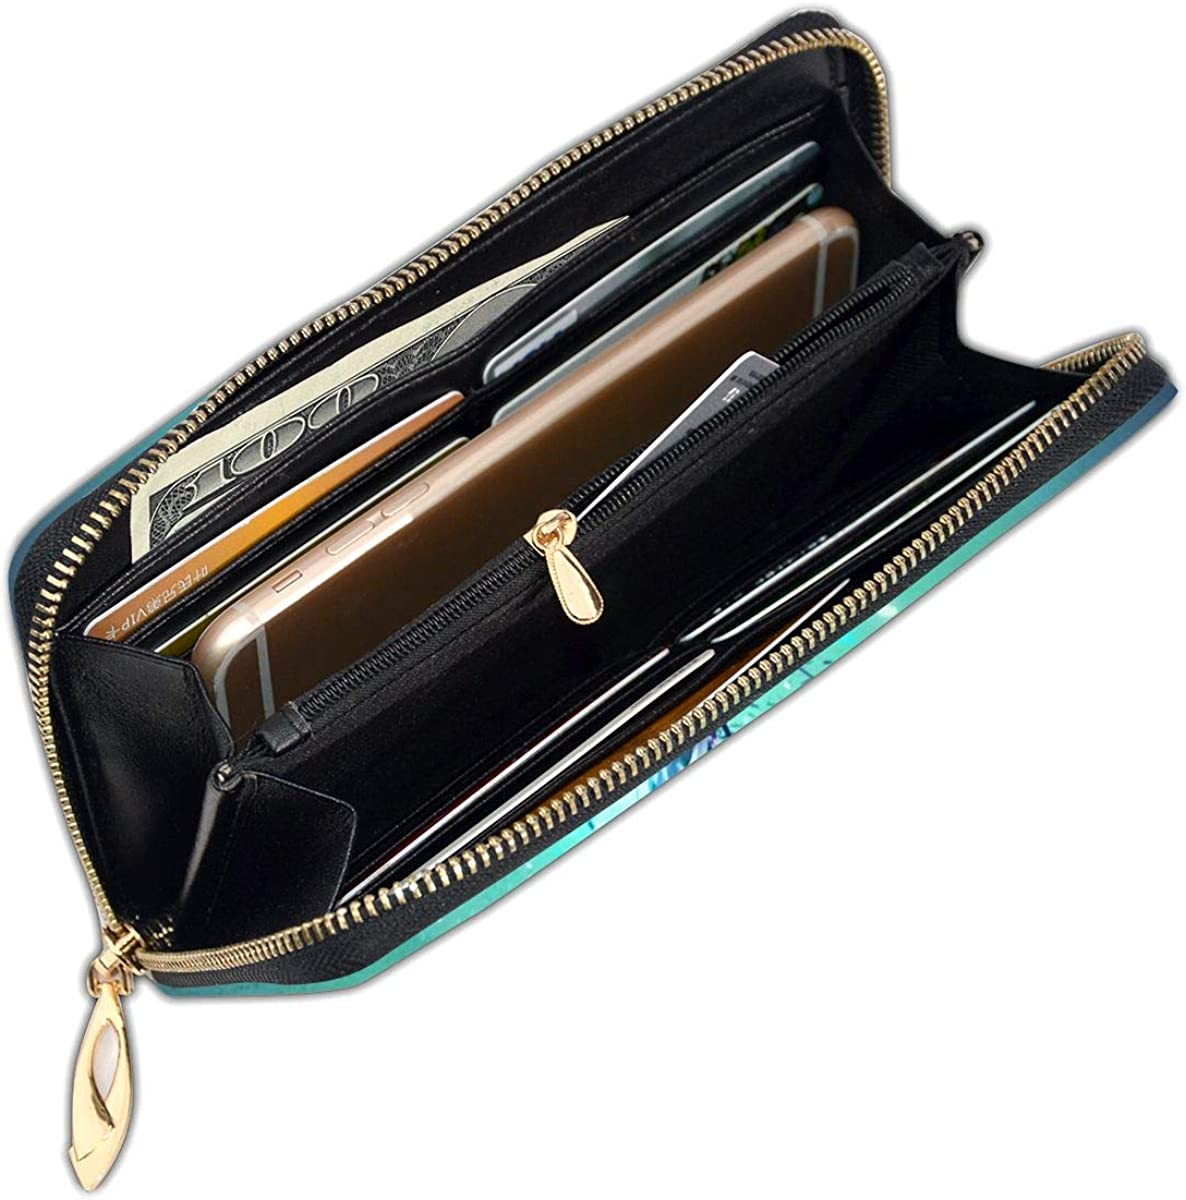 Animal Starry Hummingbird Wallets For Men Women Long Leather Checkbook Card Holder Purse Zipper Buckle Elegant Clutch Ladies Coin Purse